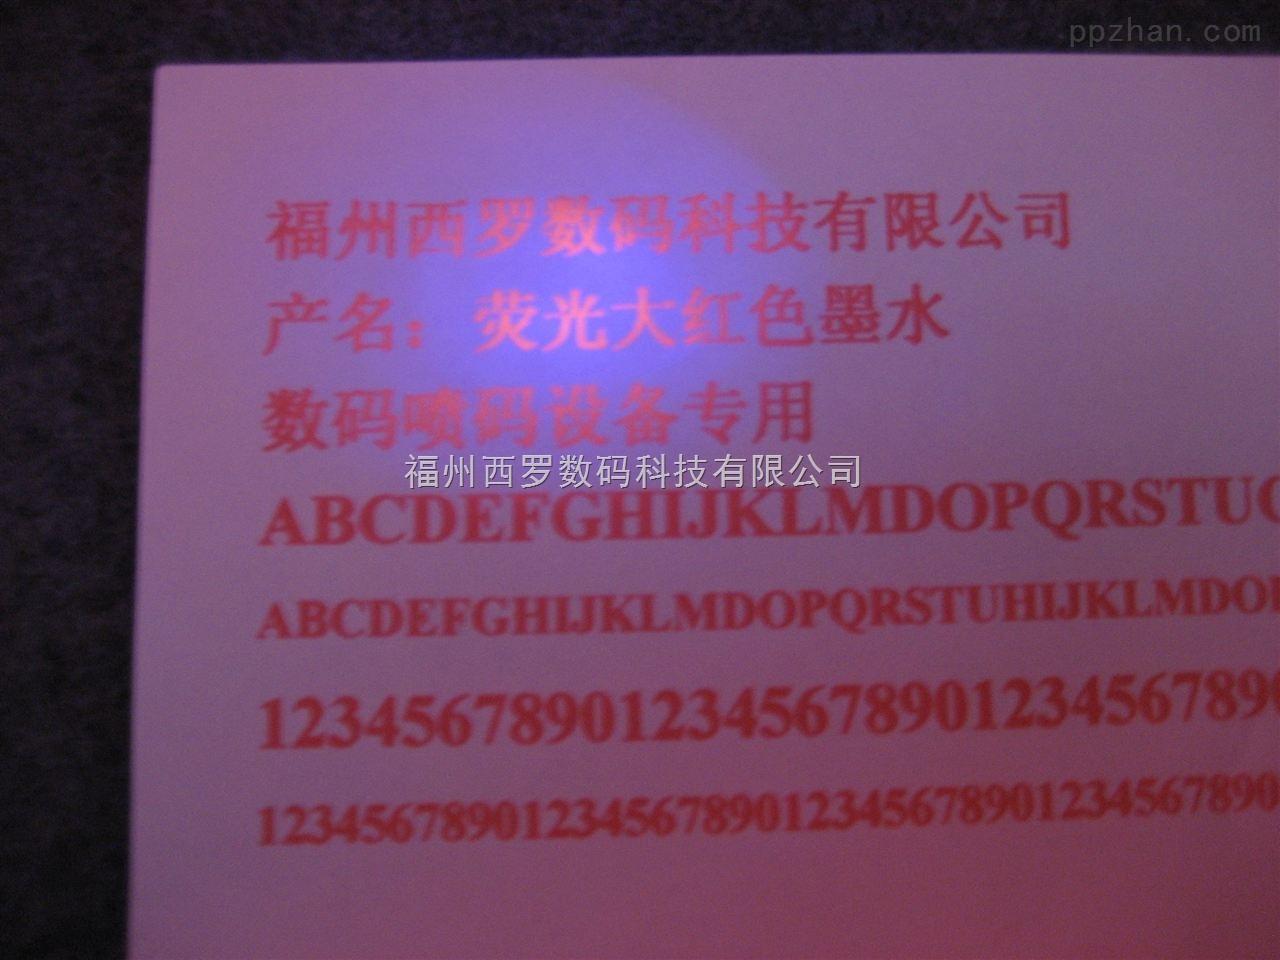 HP数码喷印可变信息数字单据喷印喷码专用防伪荧光墨水大红色